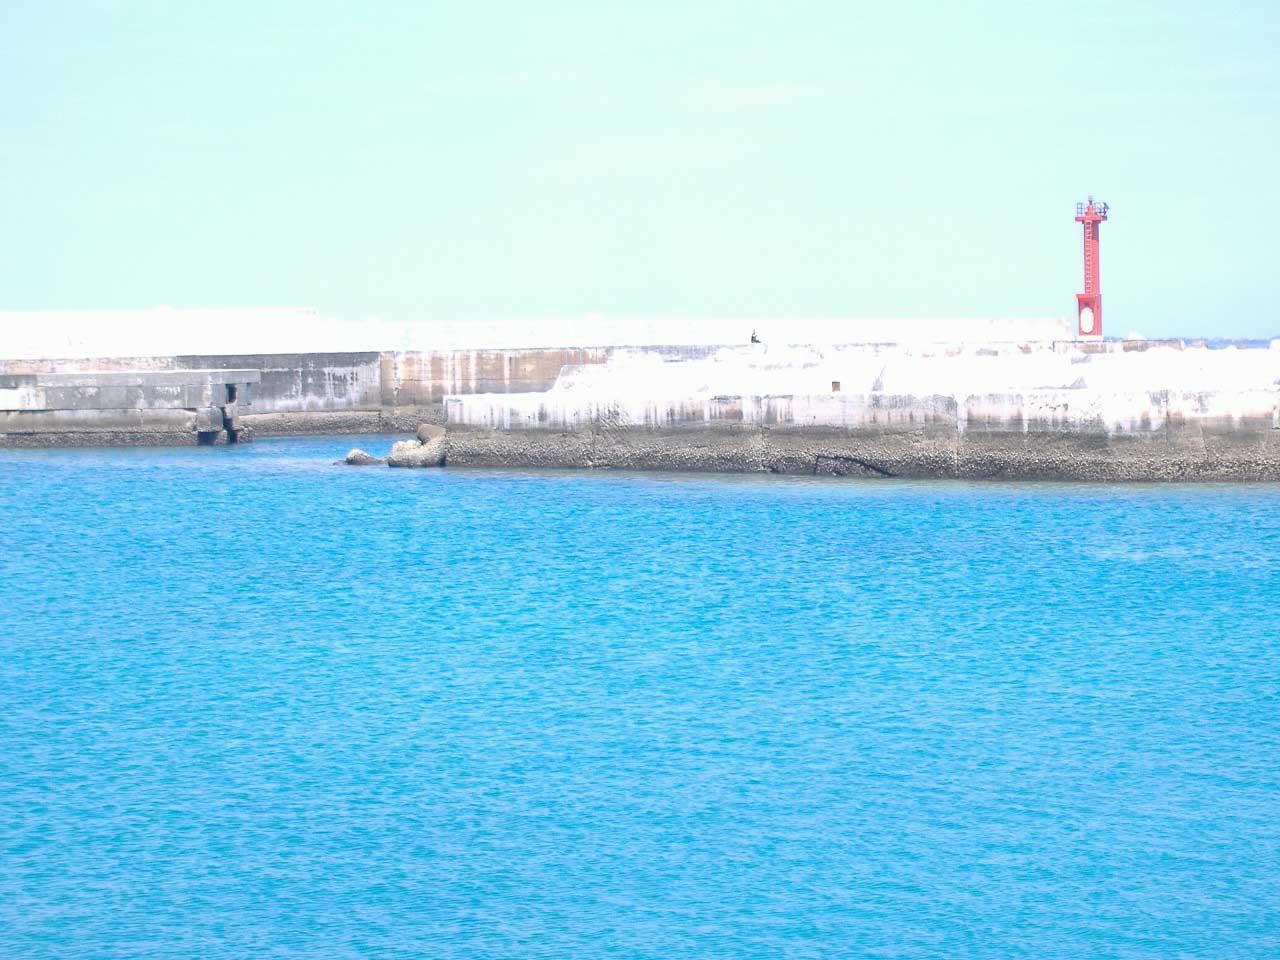 blog伊良部島佐良浜漁港1080405.jpg